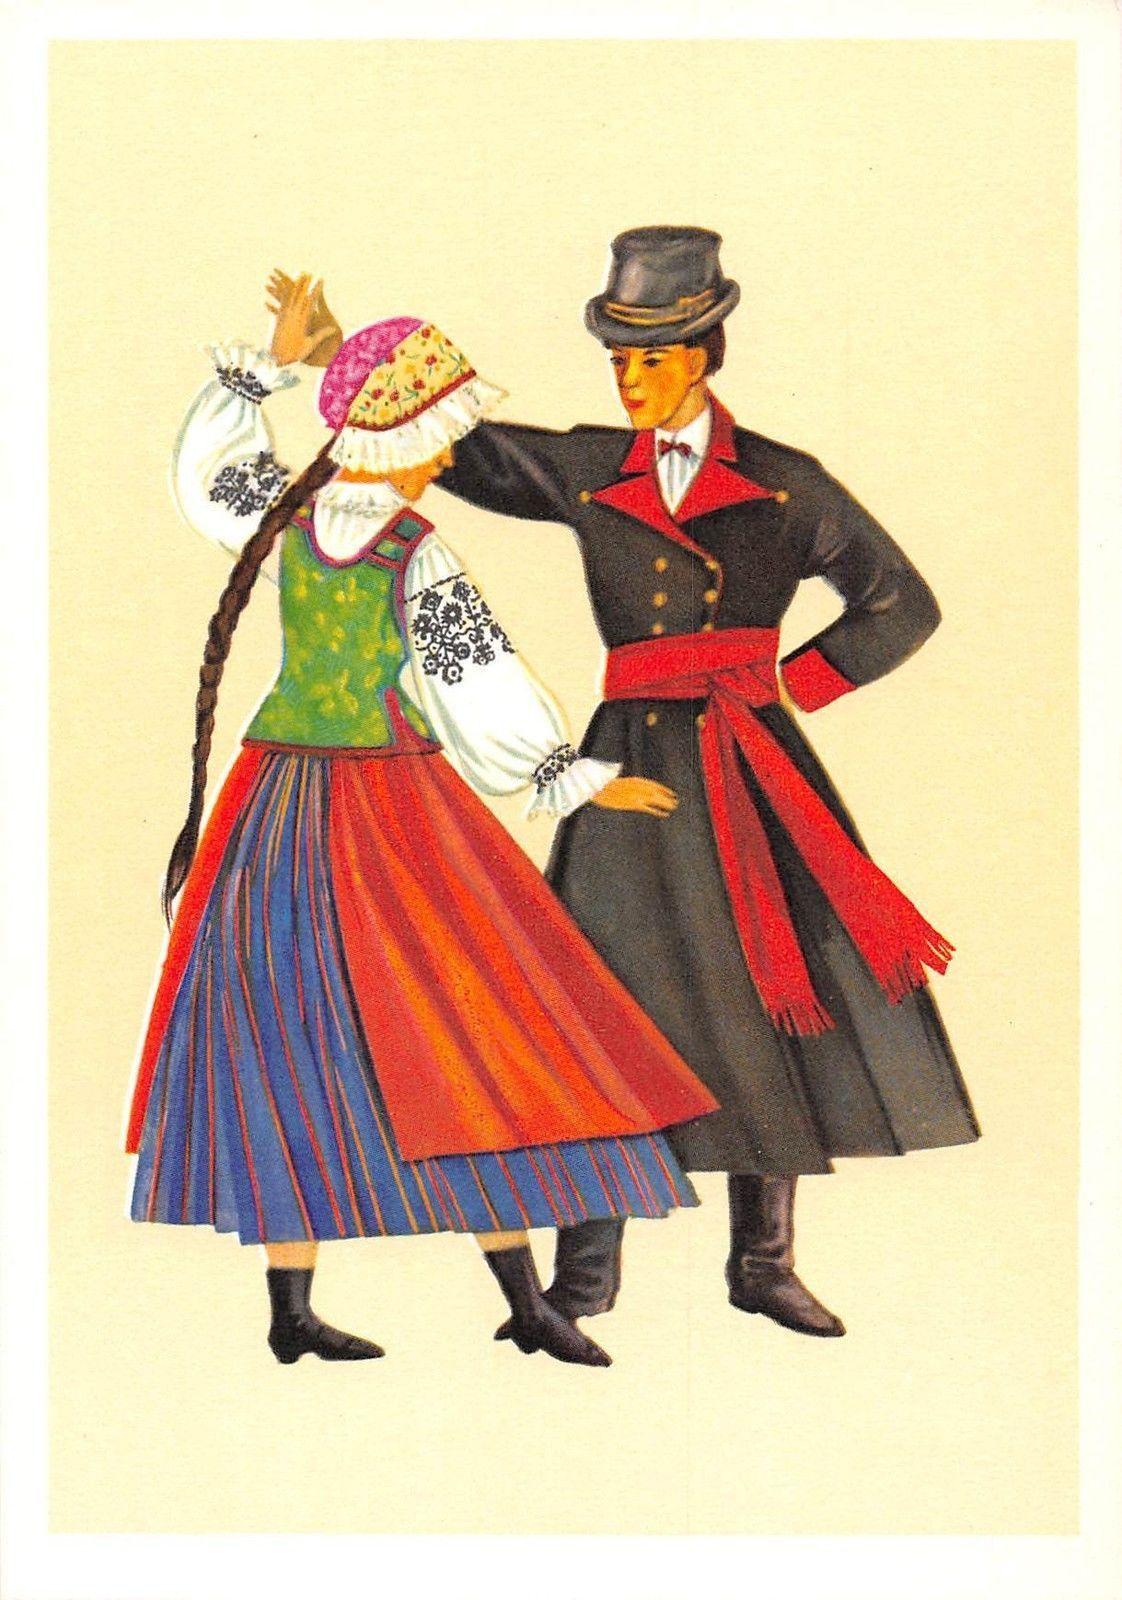 Costume Folklorique poland trachten costume polskie stroje ludowe stroj wilanowski dance